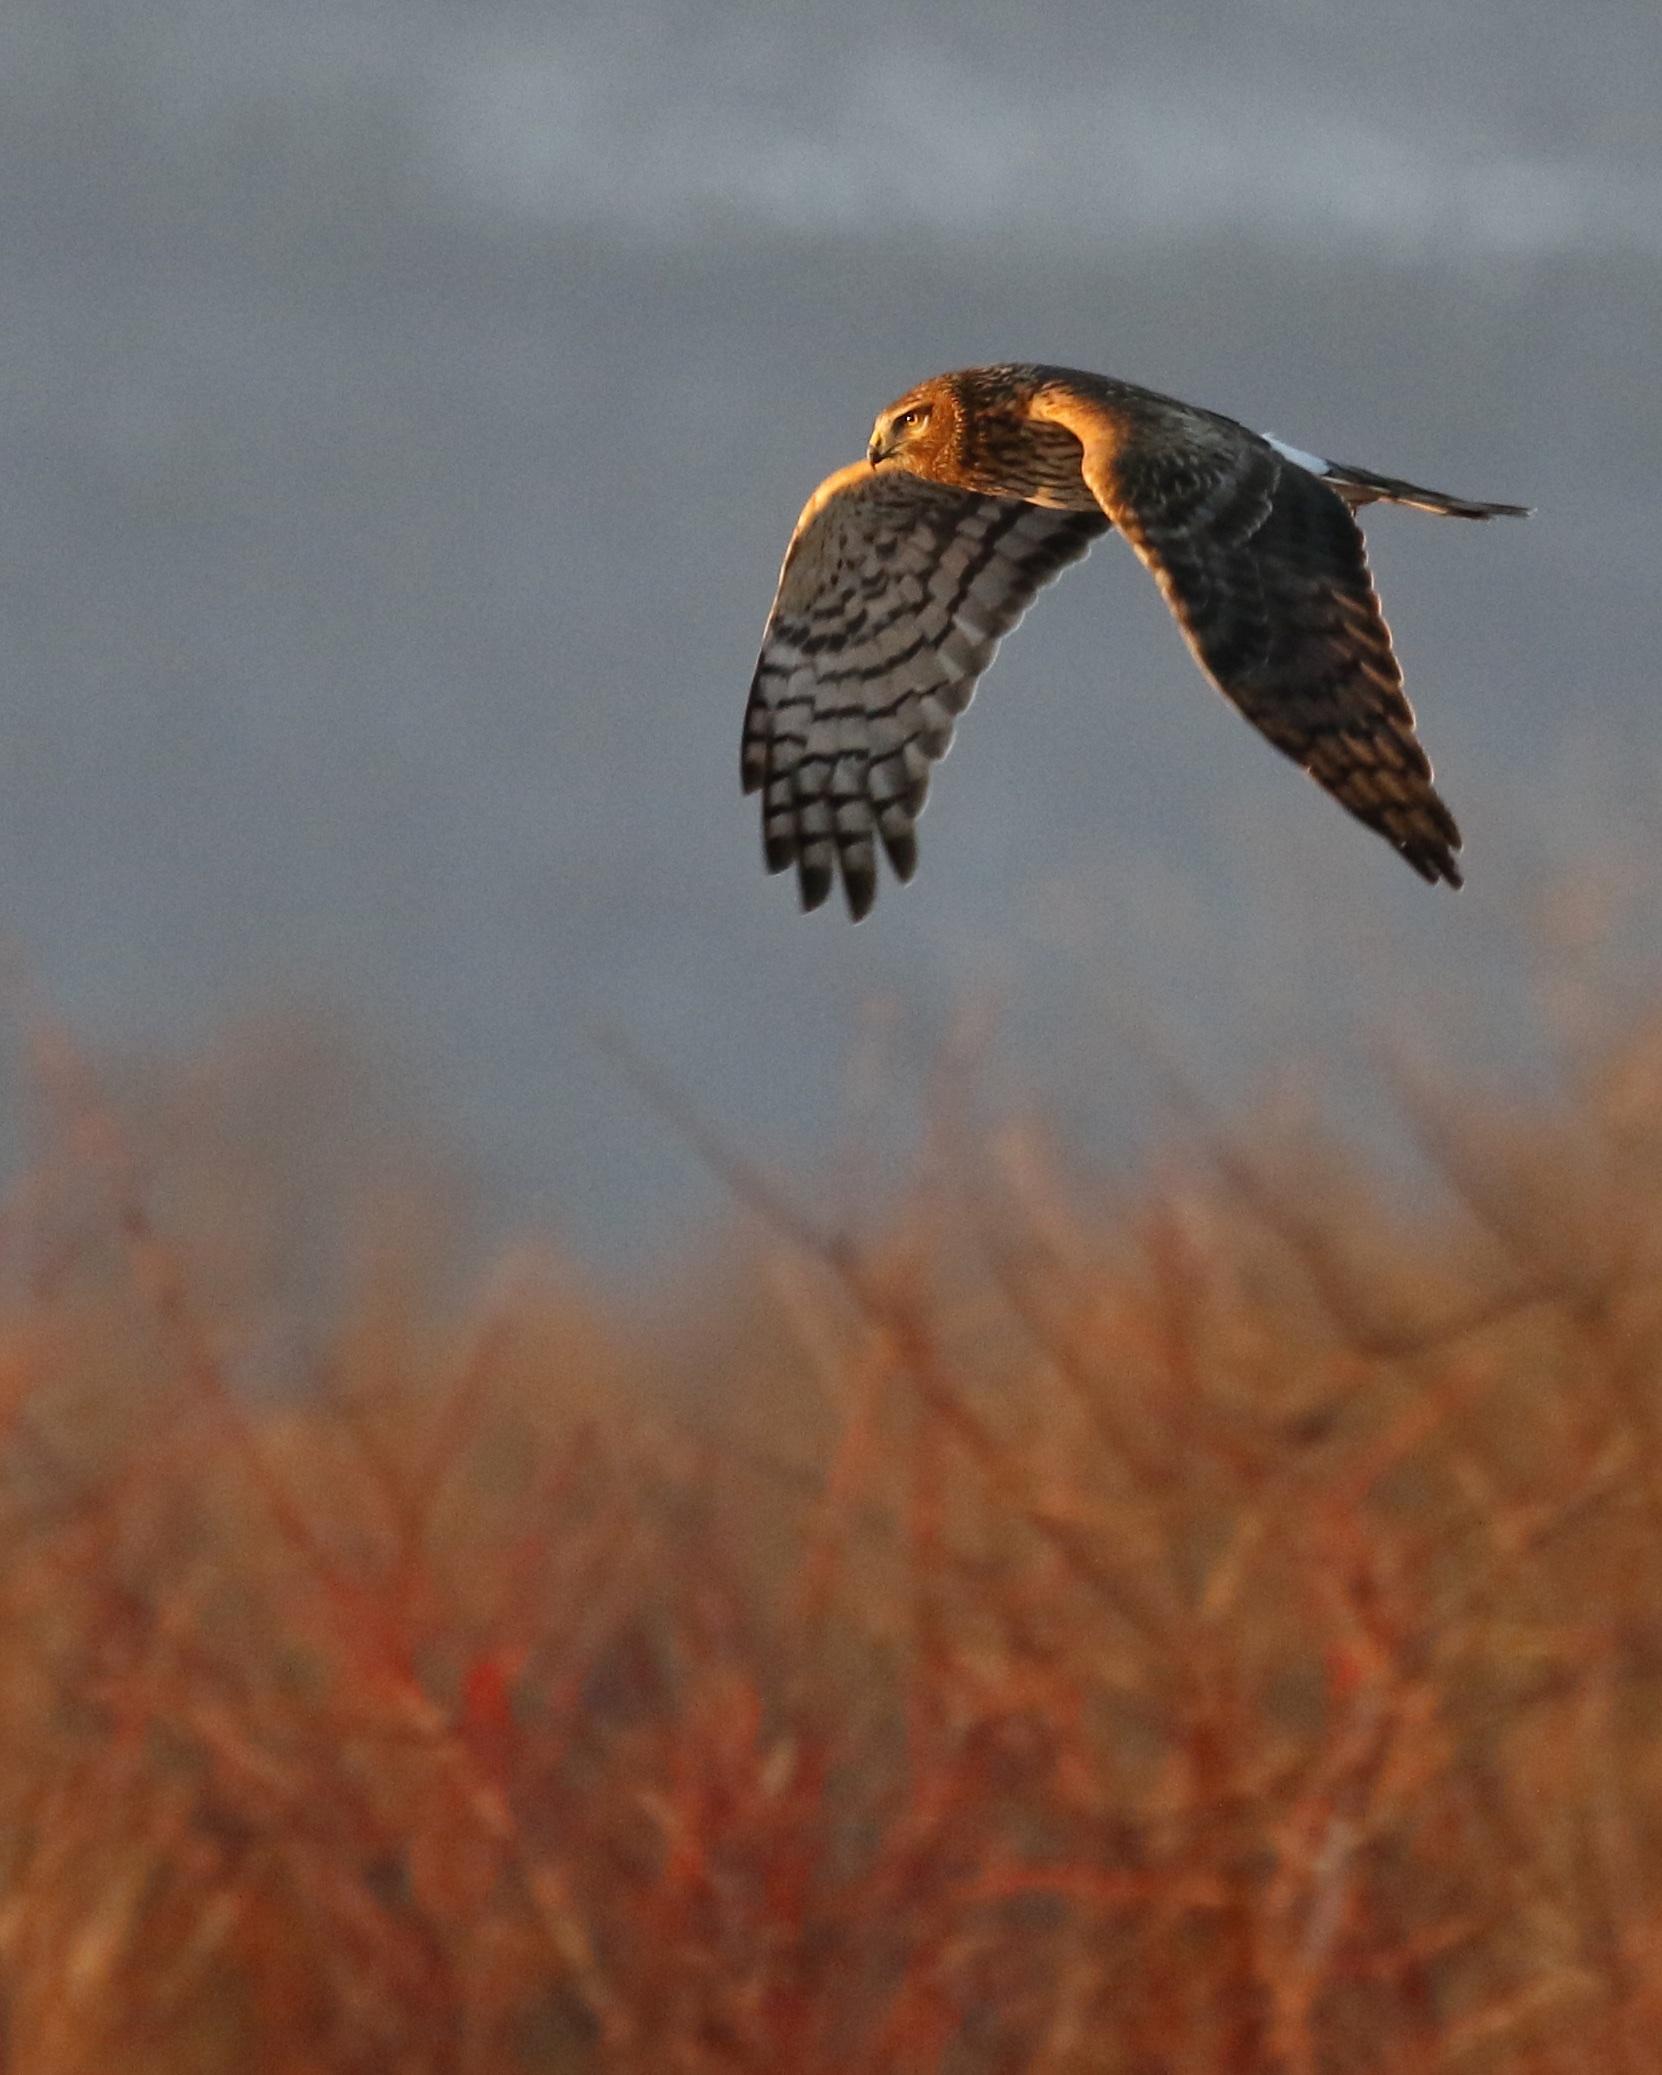 ~Northern Harrier at the Grasslands, 1/17/15.~